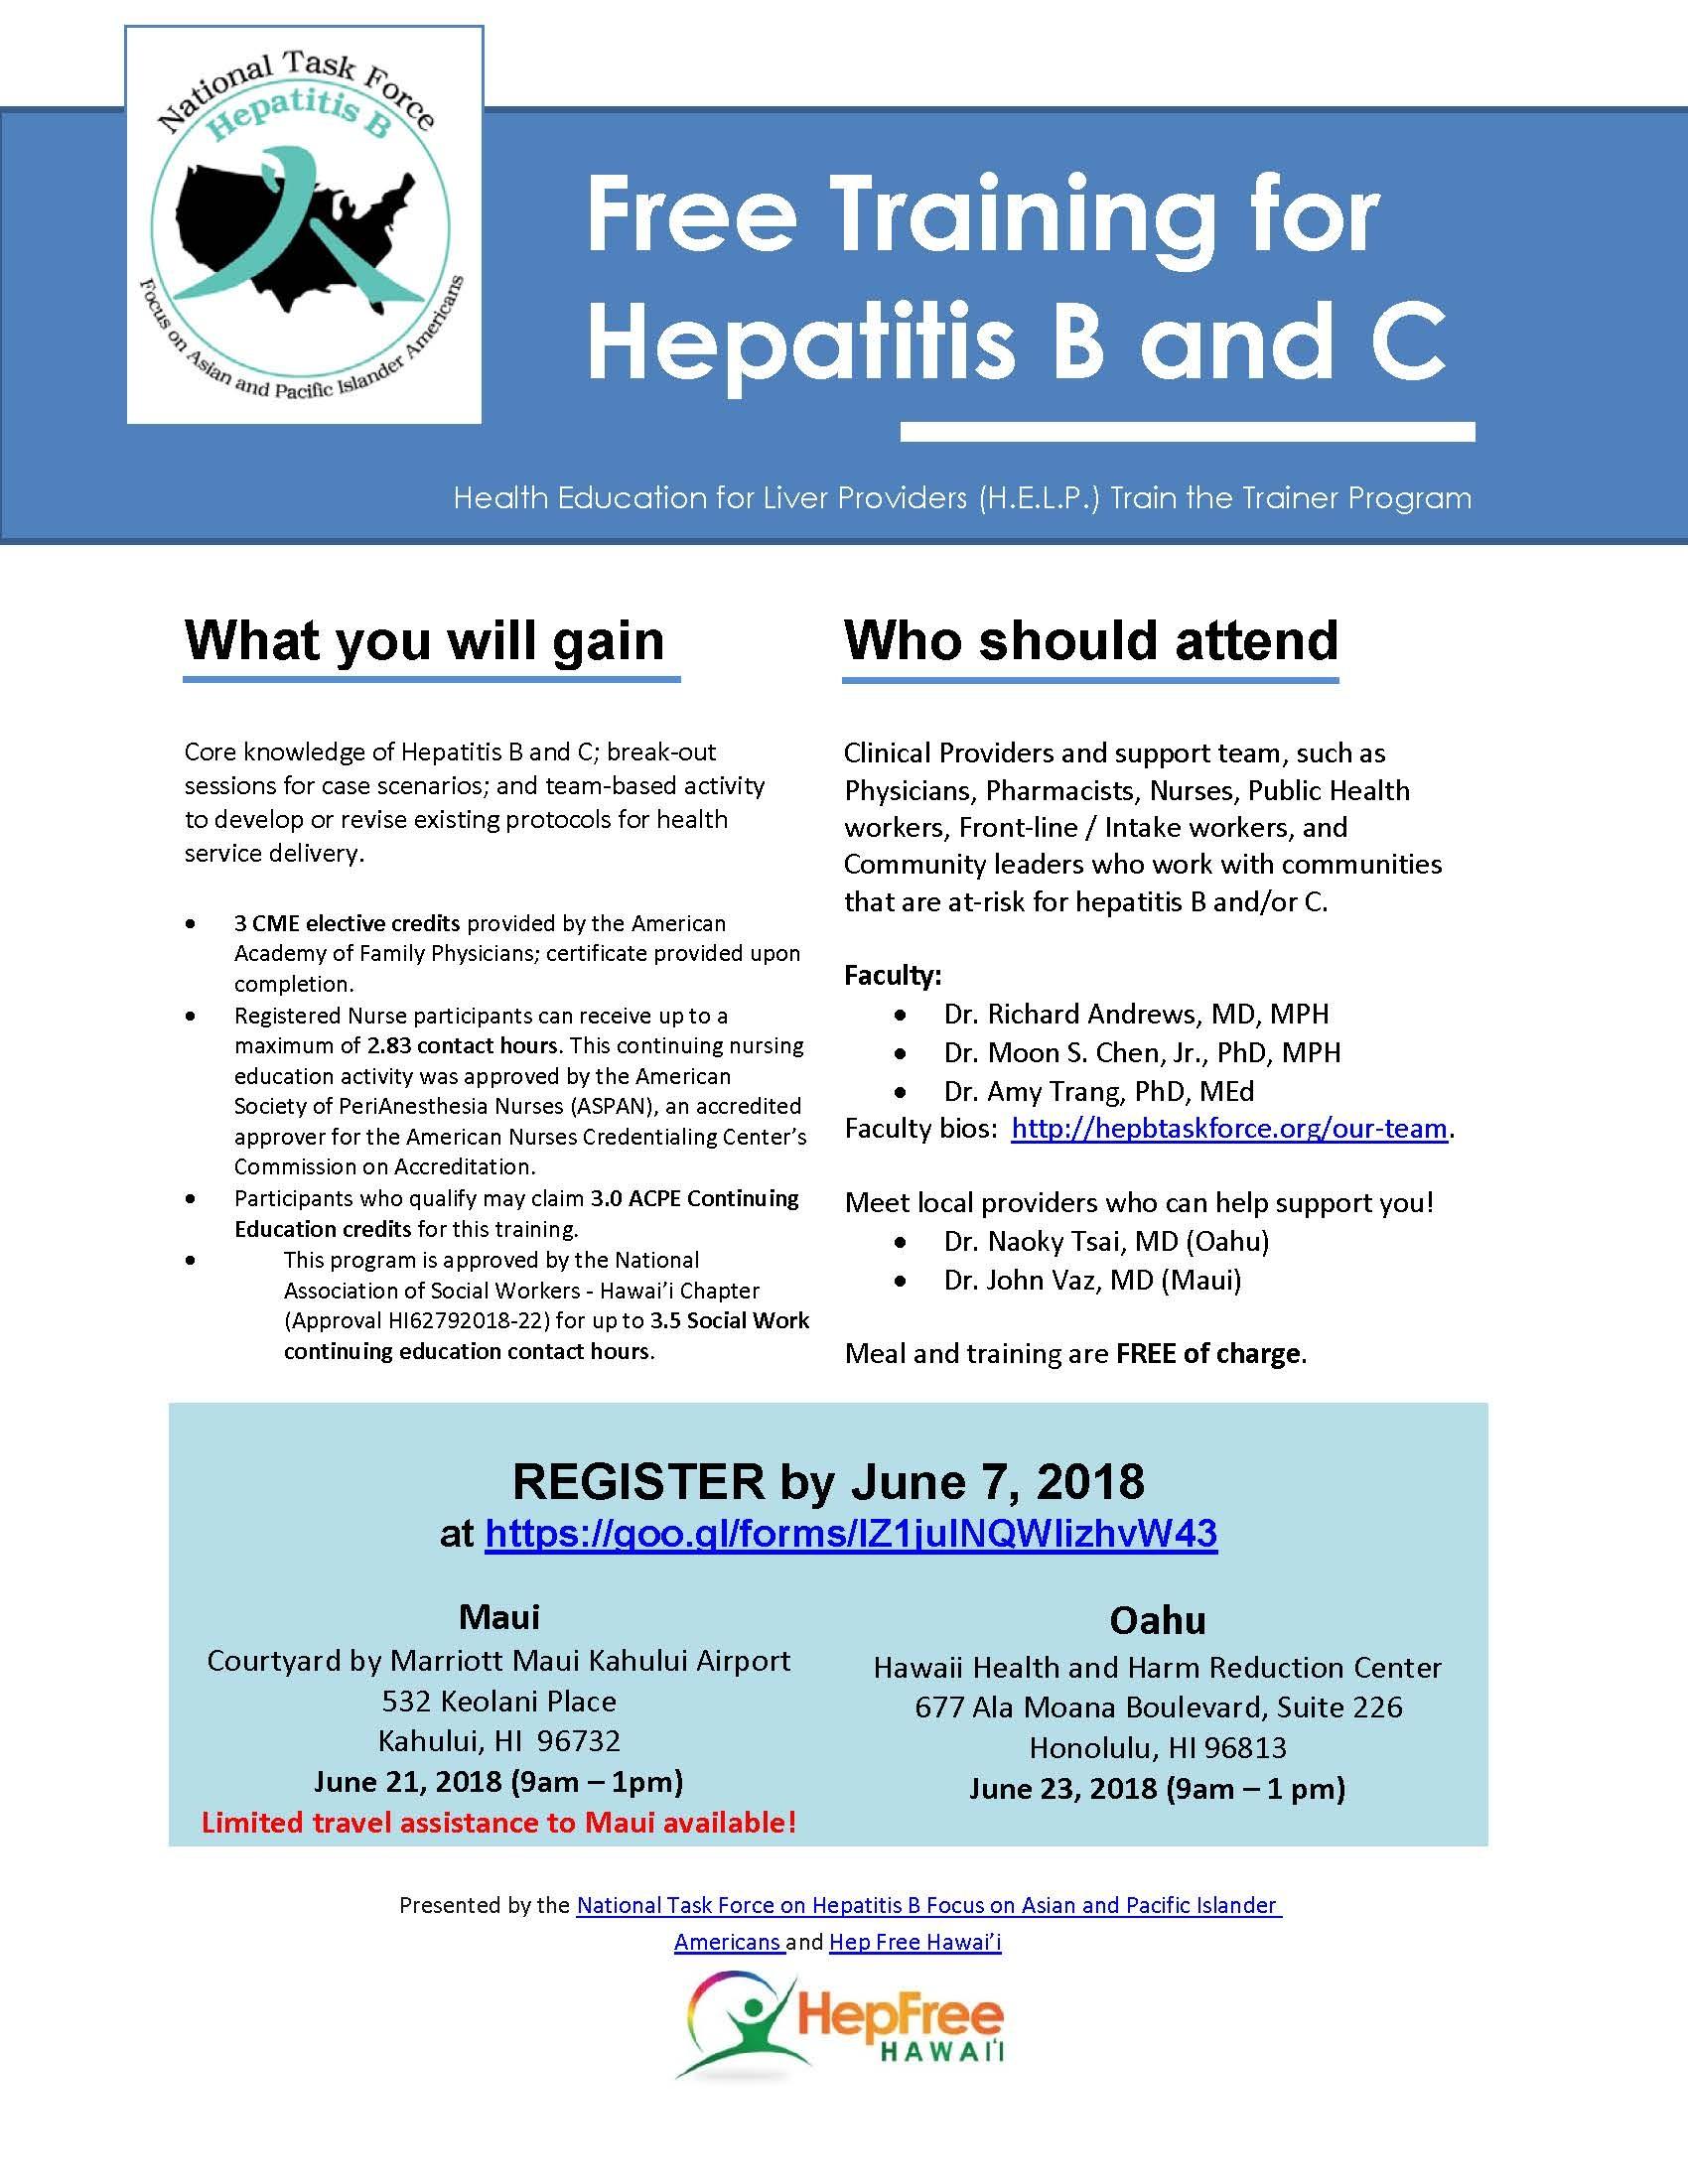 Handout-Hawaii Hep Training June 2018 (updated 6-4-2018).jpg